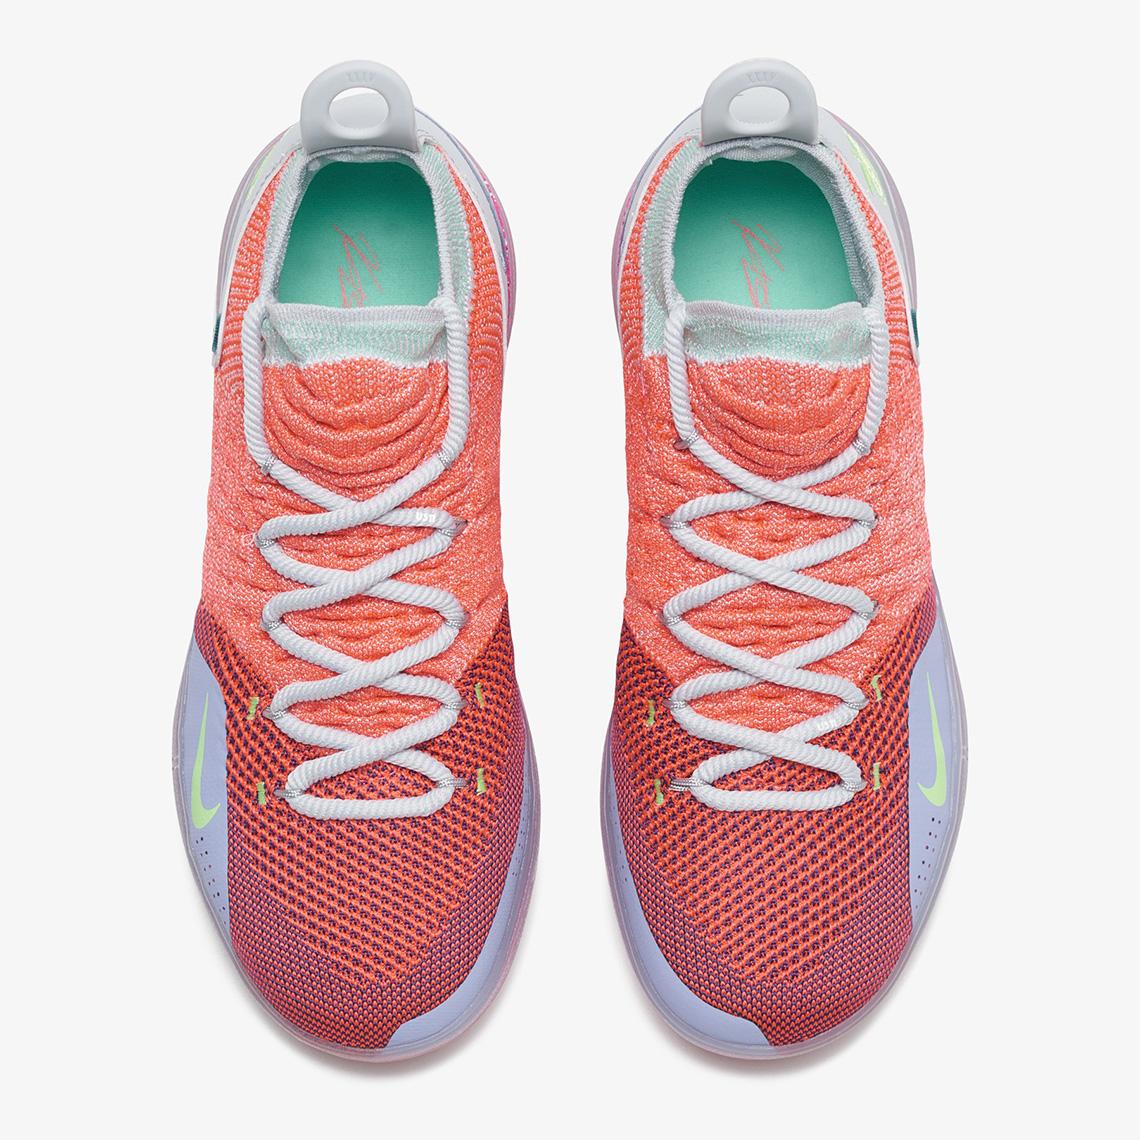 kd 11 peach jam footlocker buy clothes